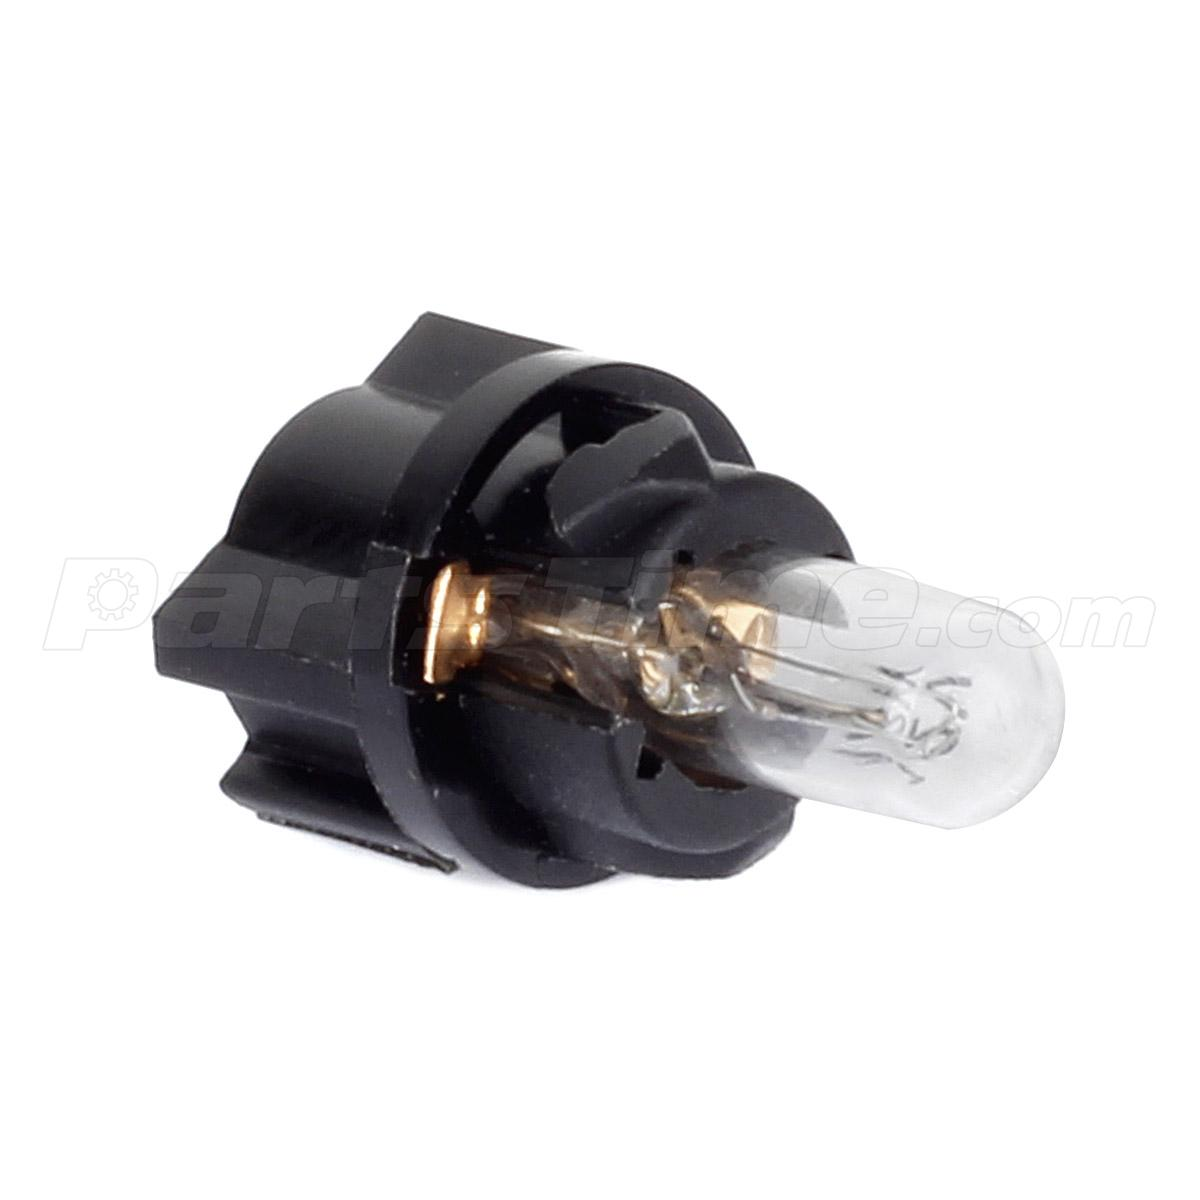 60x T5 74 Led Dashboard Speedometer Gauge Indicator Light: 10x T5 Bright White Halogen Light Bulbs 73 74 Instrument